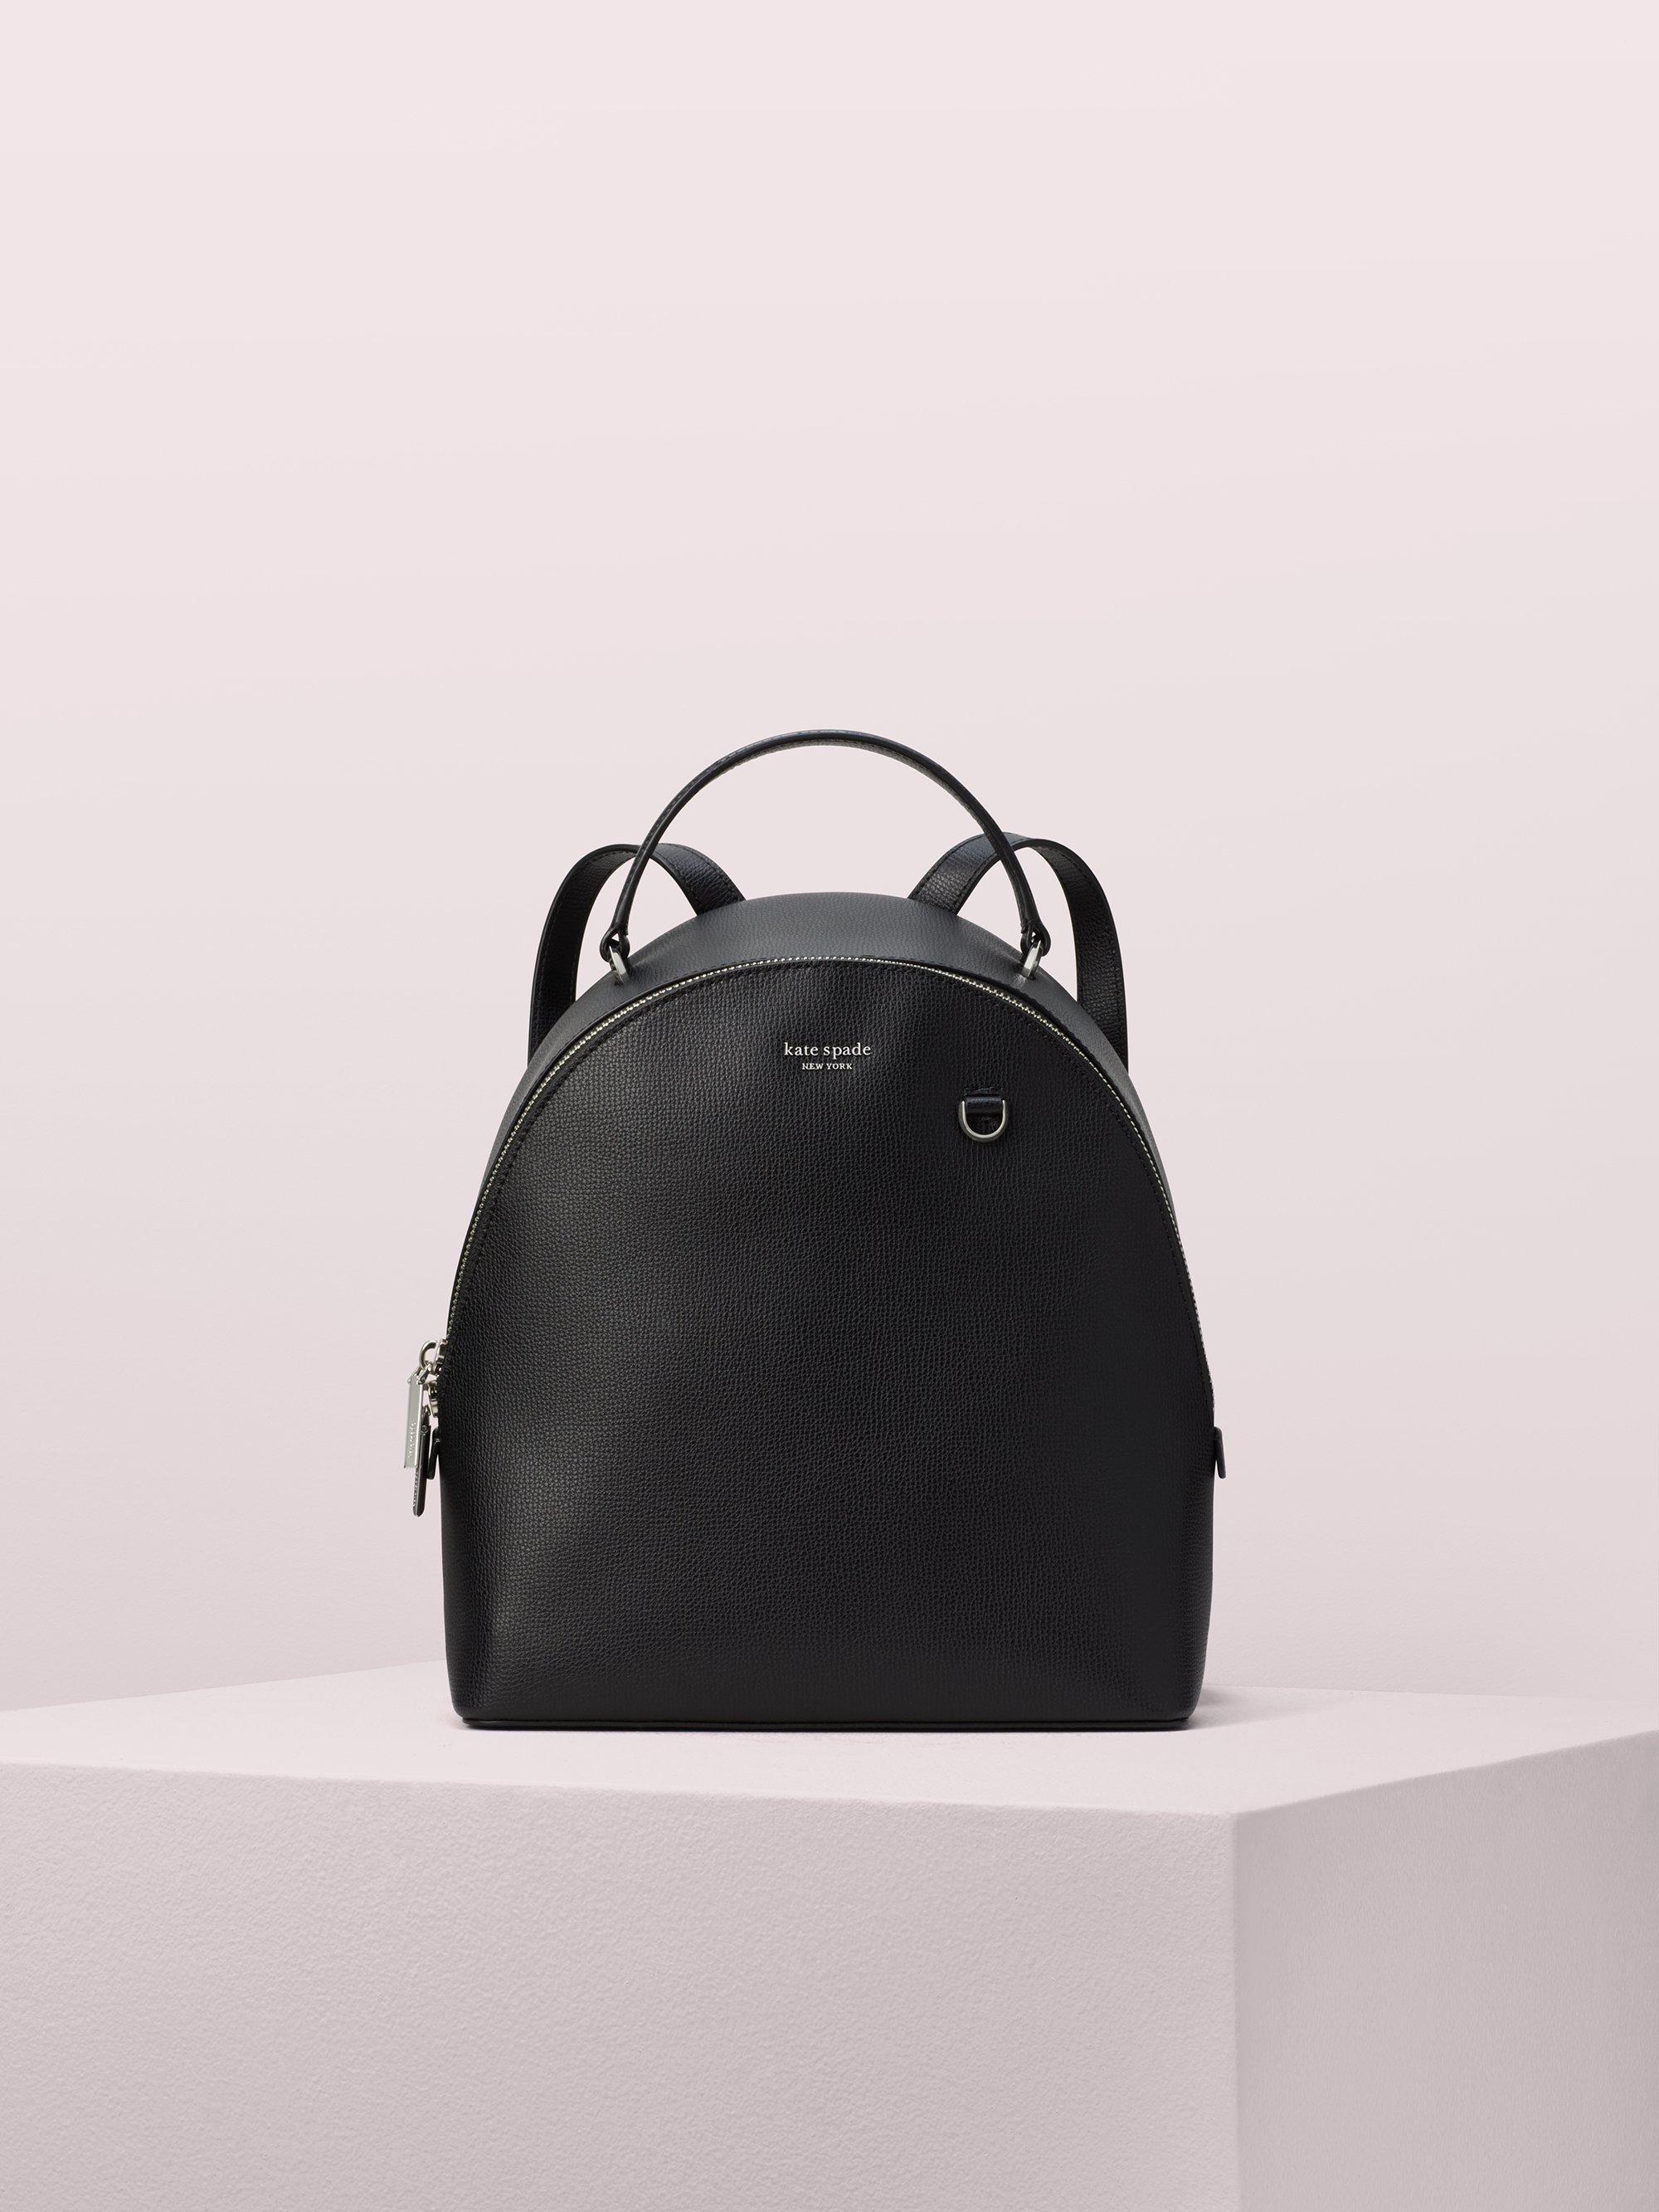 00e6a65ca6df Kate Spade Sylvia Medium Backpack in Black - Save 30% - Lyst